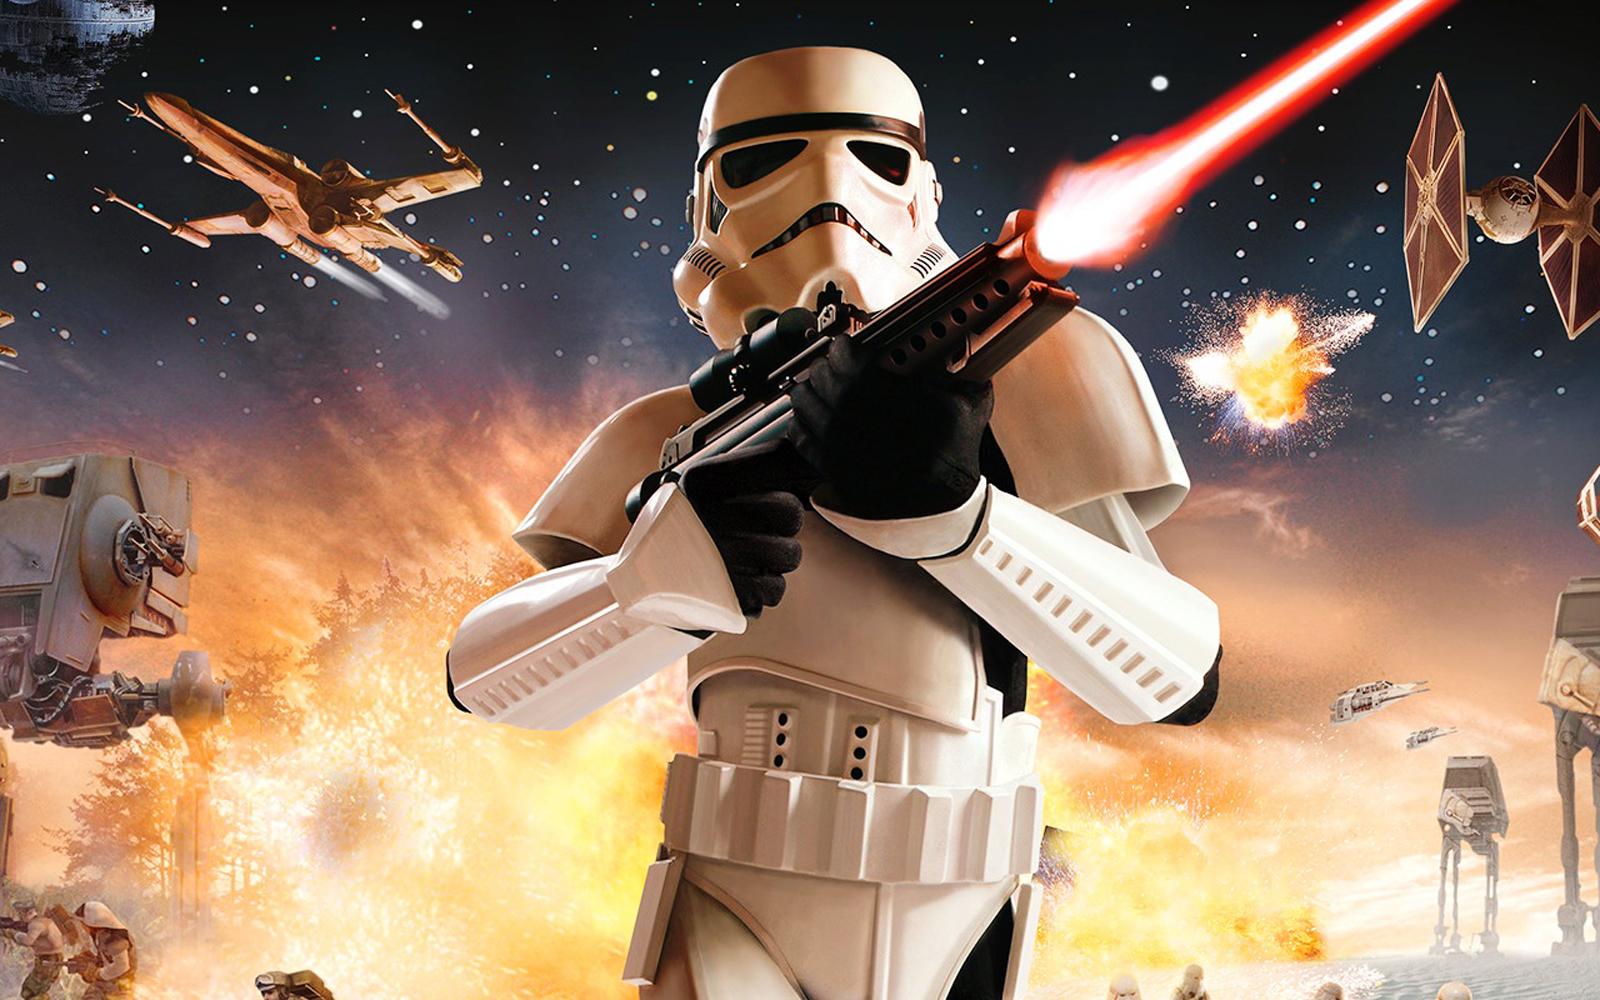 Stormtroopers Star Wars HD Wallpapers  HD Wallpapers ...